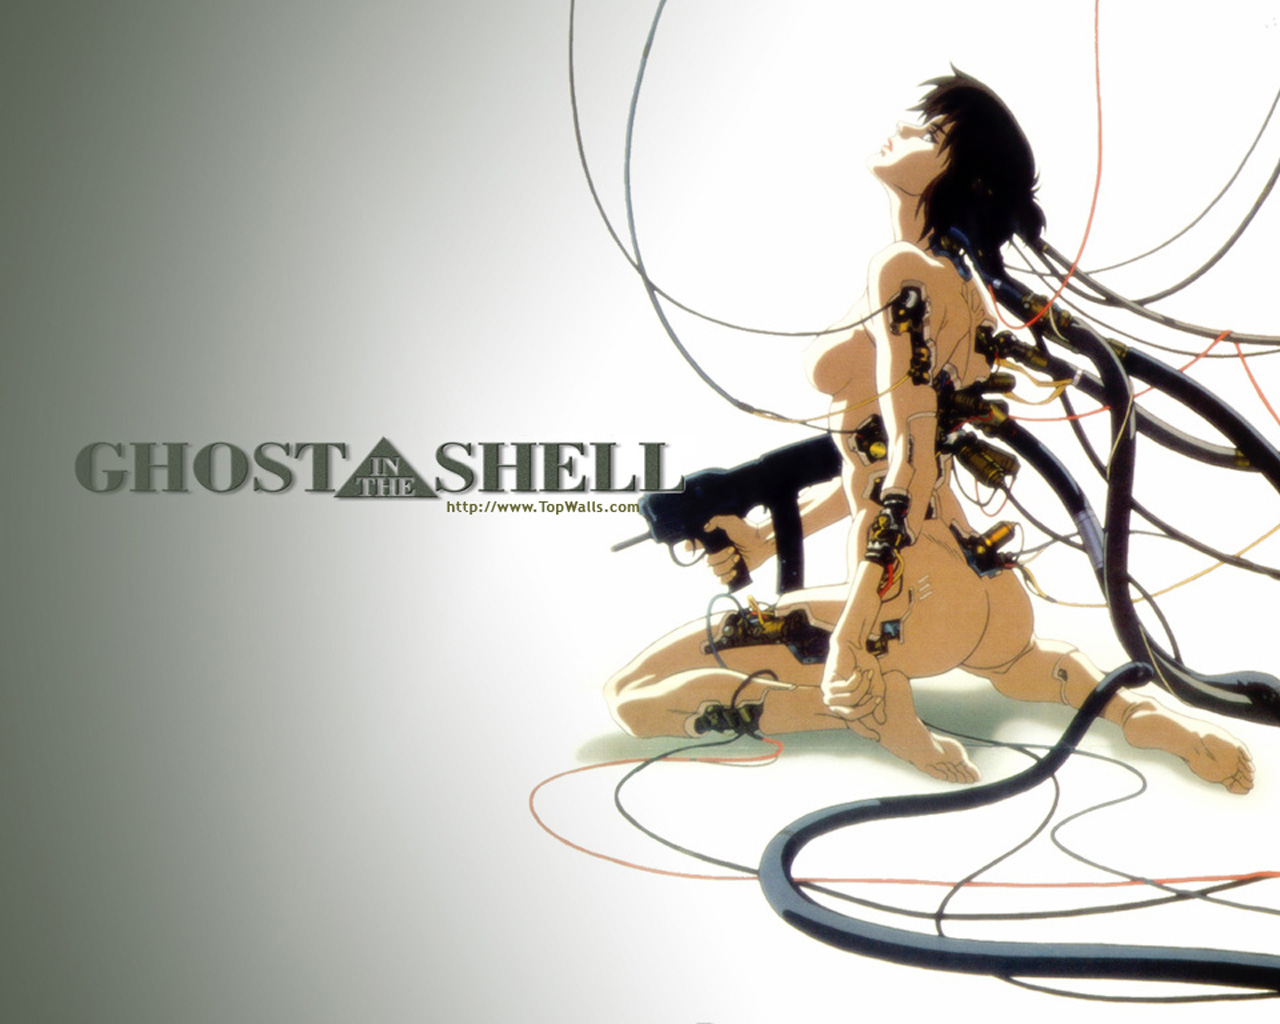 Motoko kusanagi tv ghost in the shell vs kasumi dead or ali 6